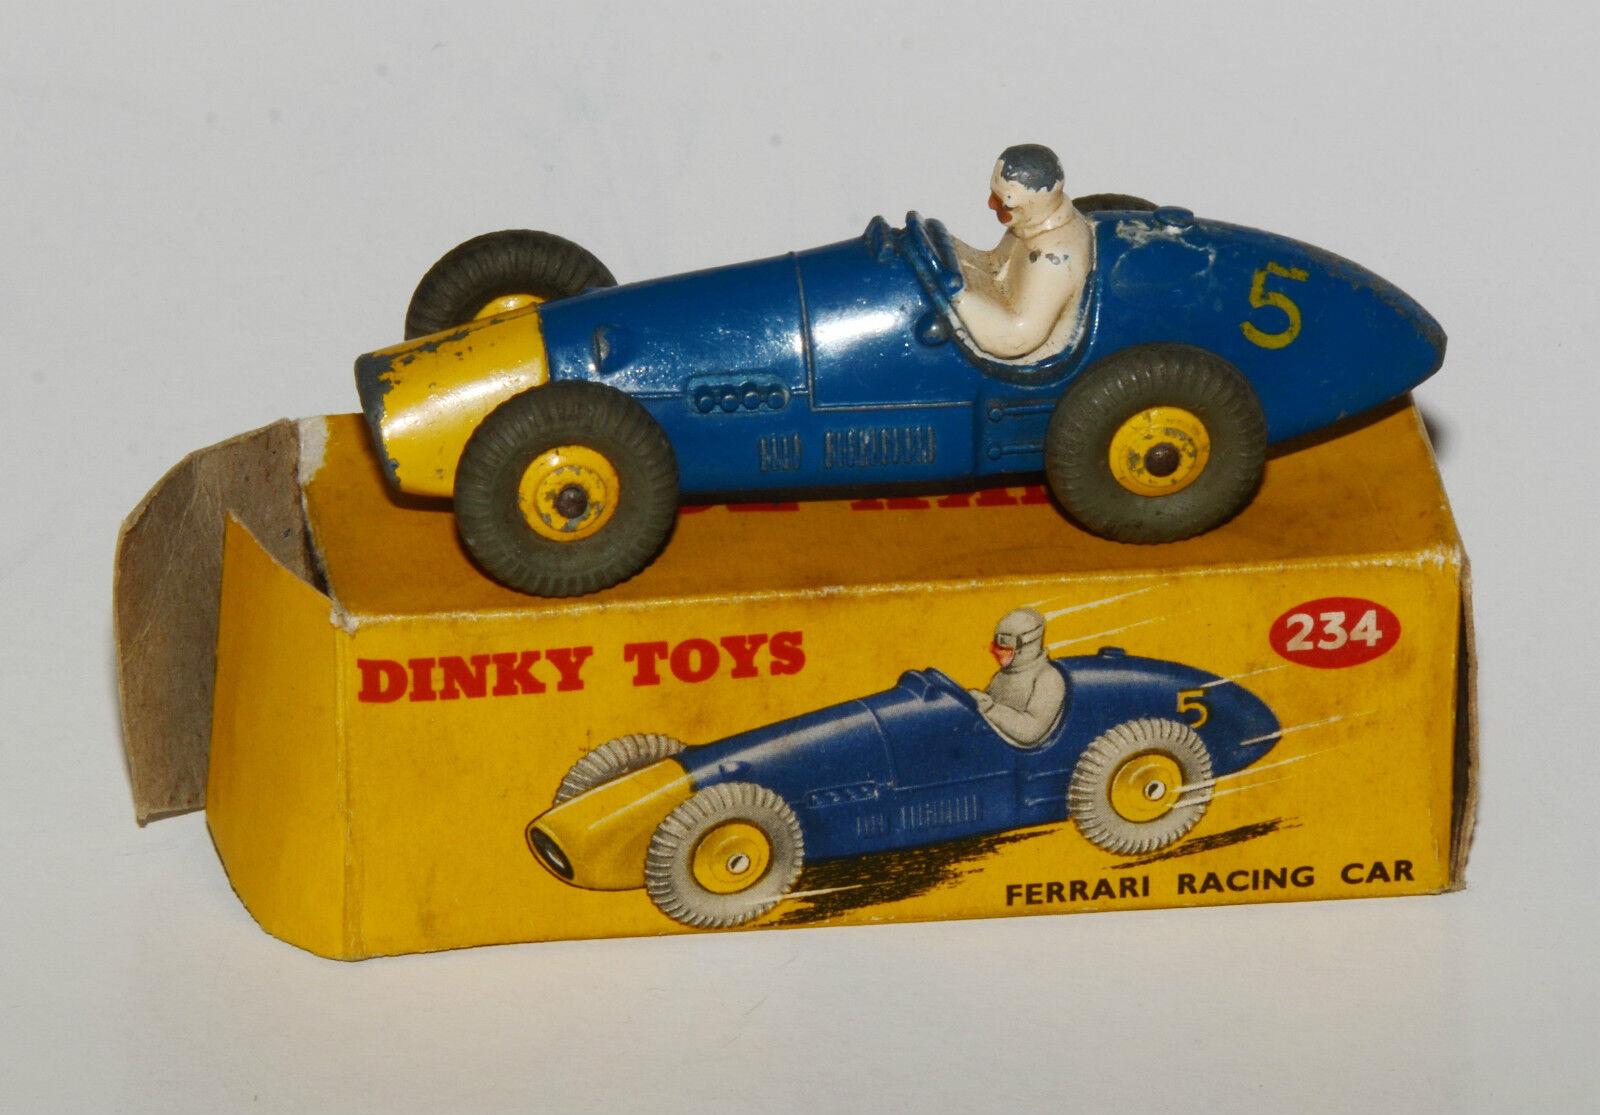 DINKY TOYS nº 234 ou 23 H-ferrari racing car dans emballage d'origine